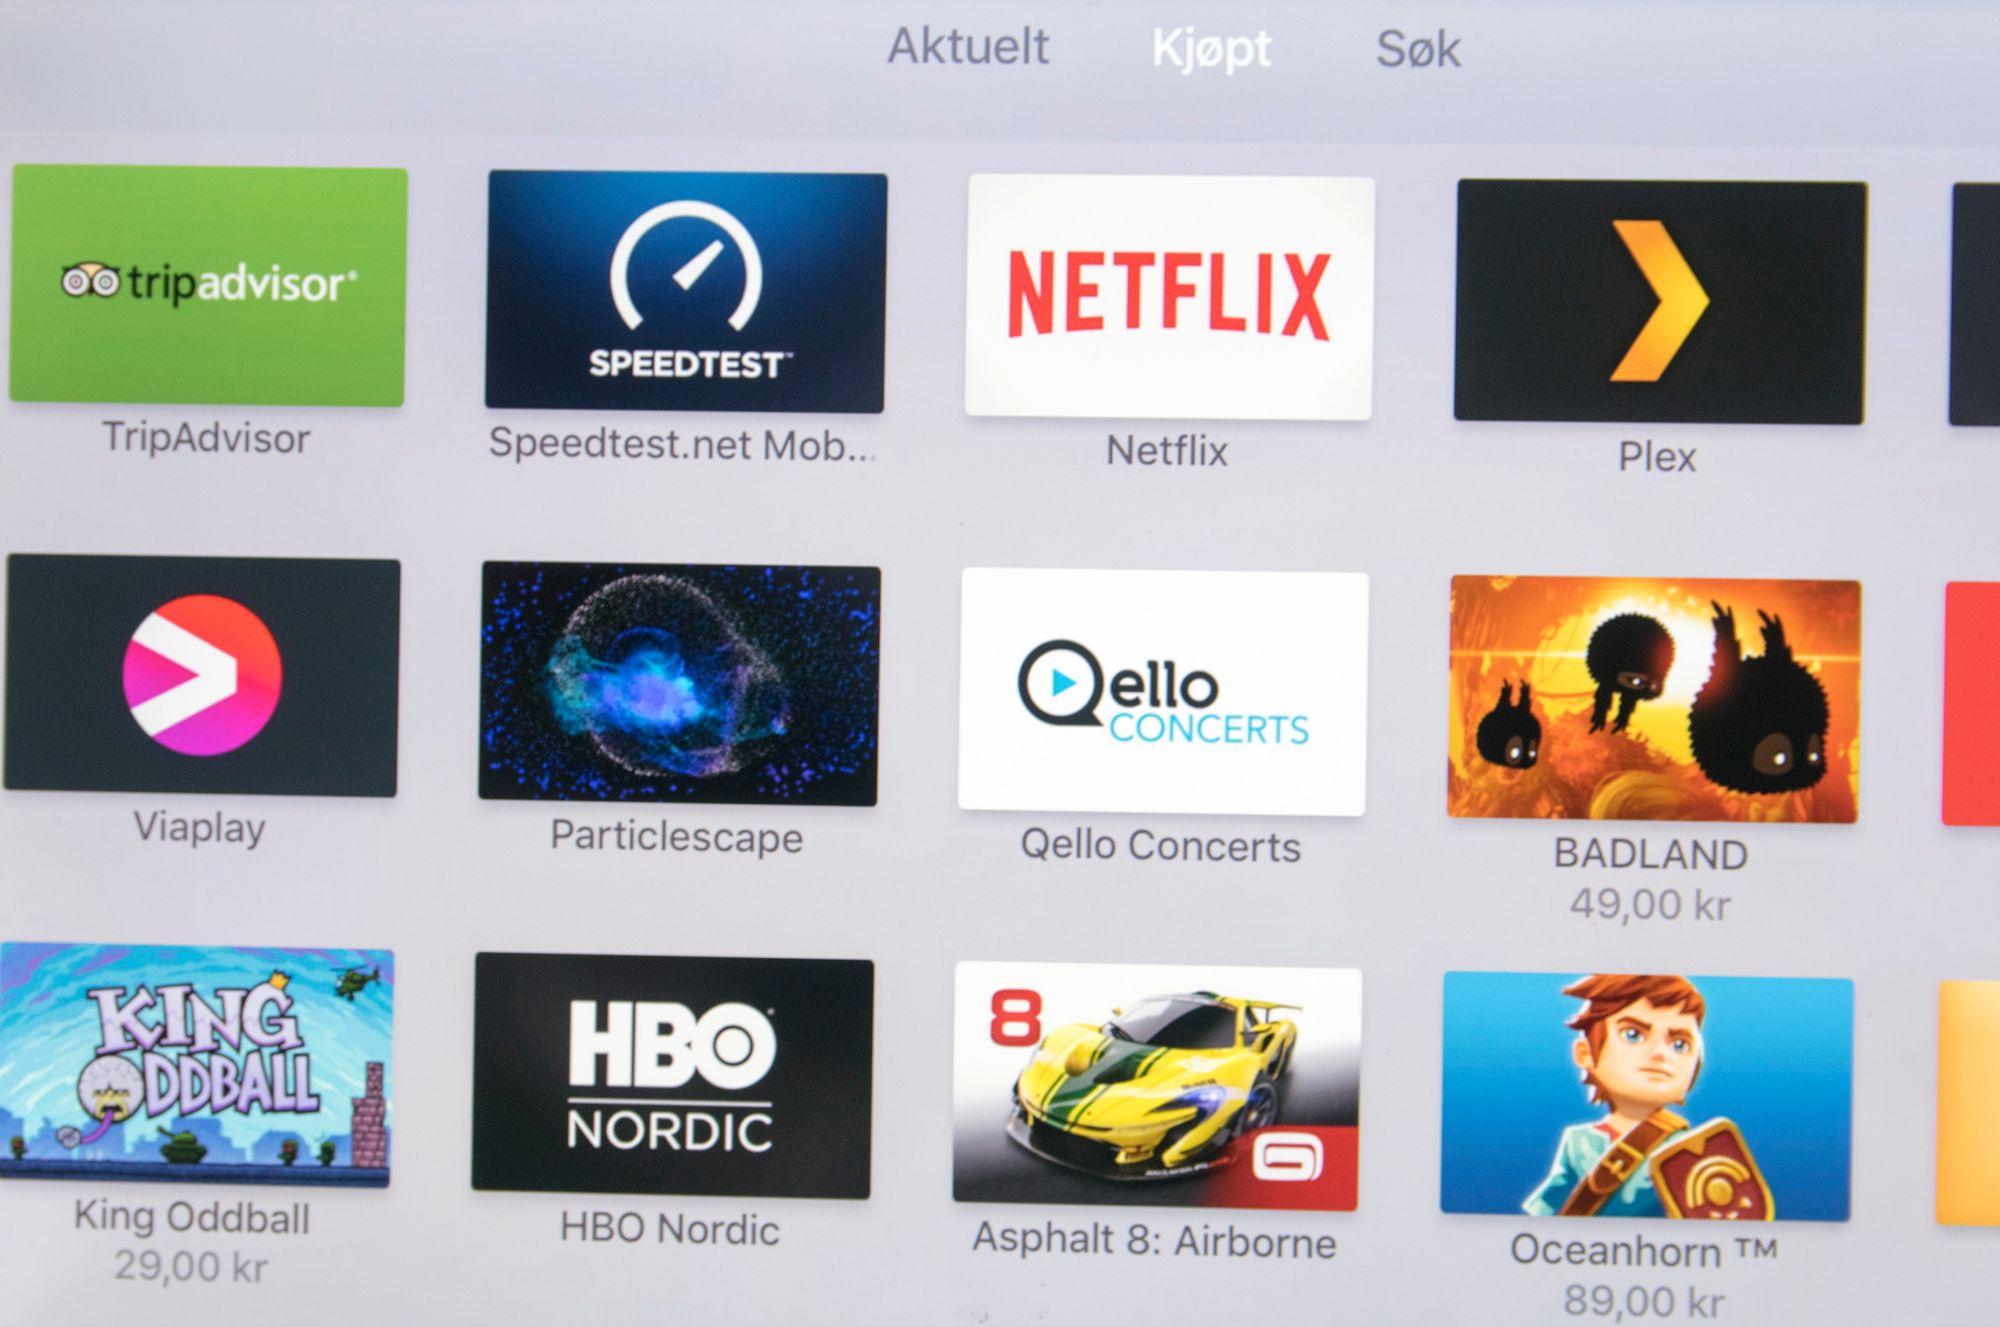 Hbo nordic apple tv problem – Gardinløsninger til store vinduer